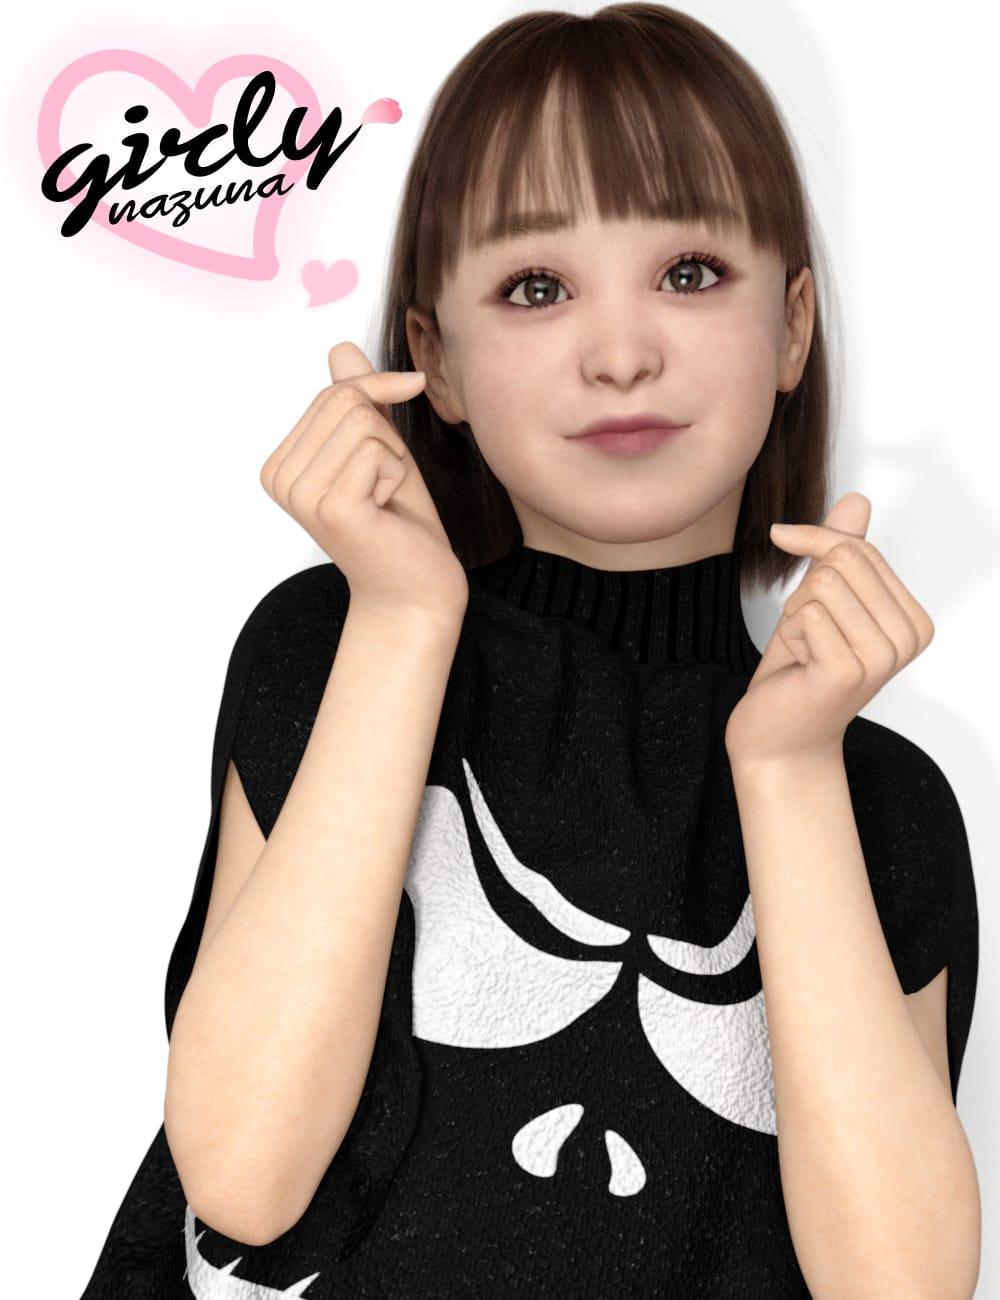 Girly Nazuna for Genesis 8 Female by: 7-ko, 3D Models by Daz 3D